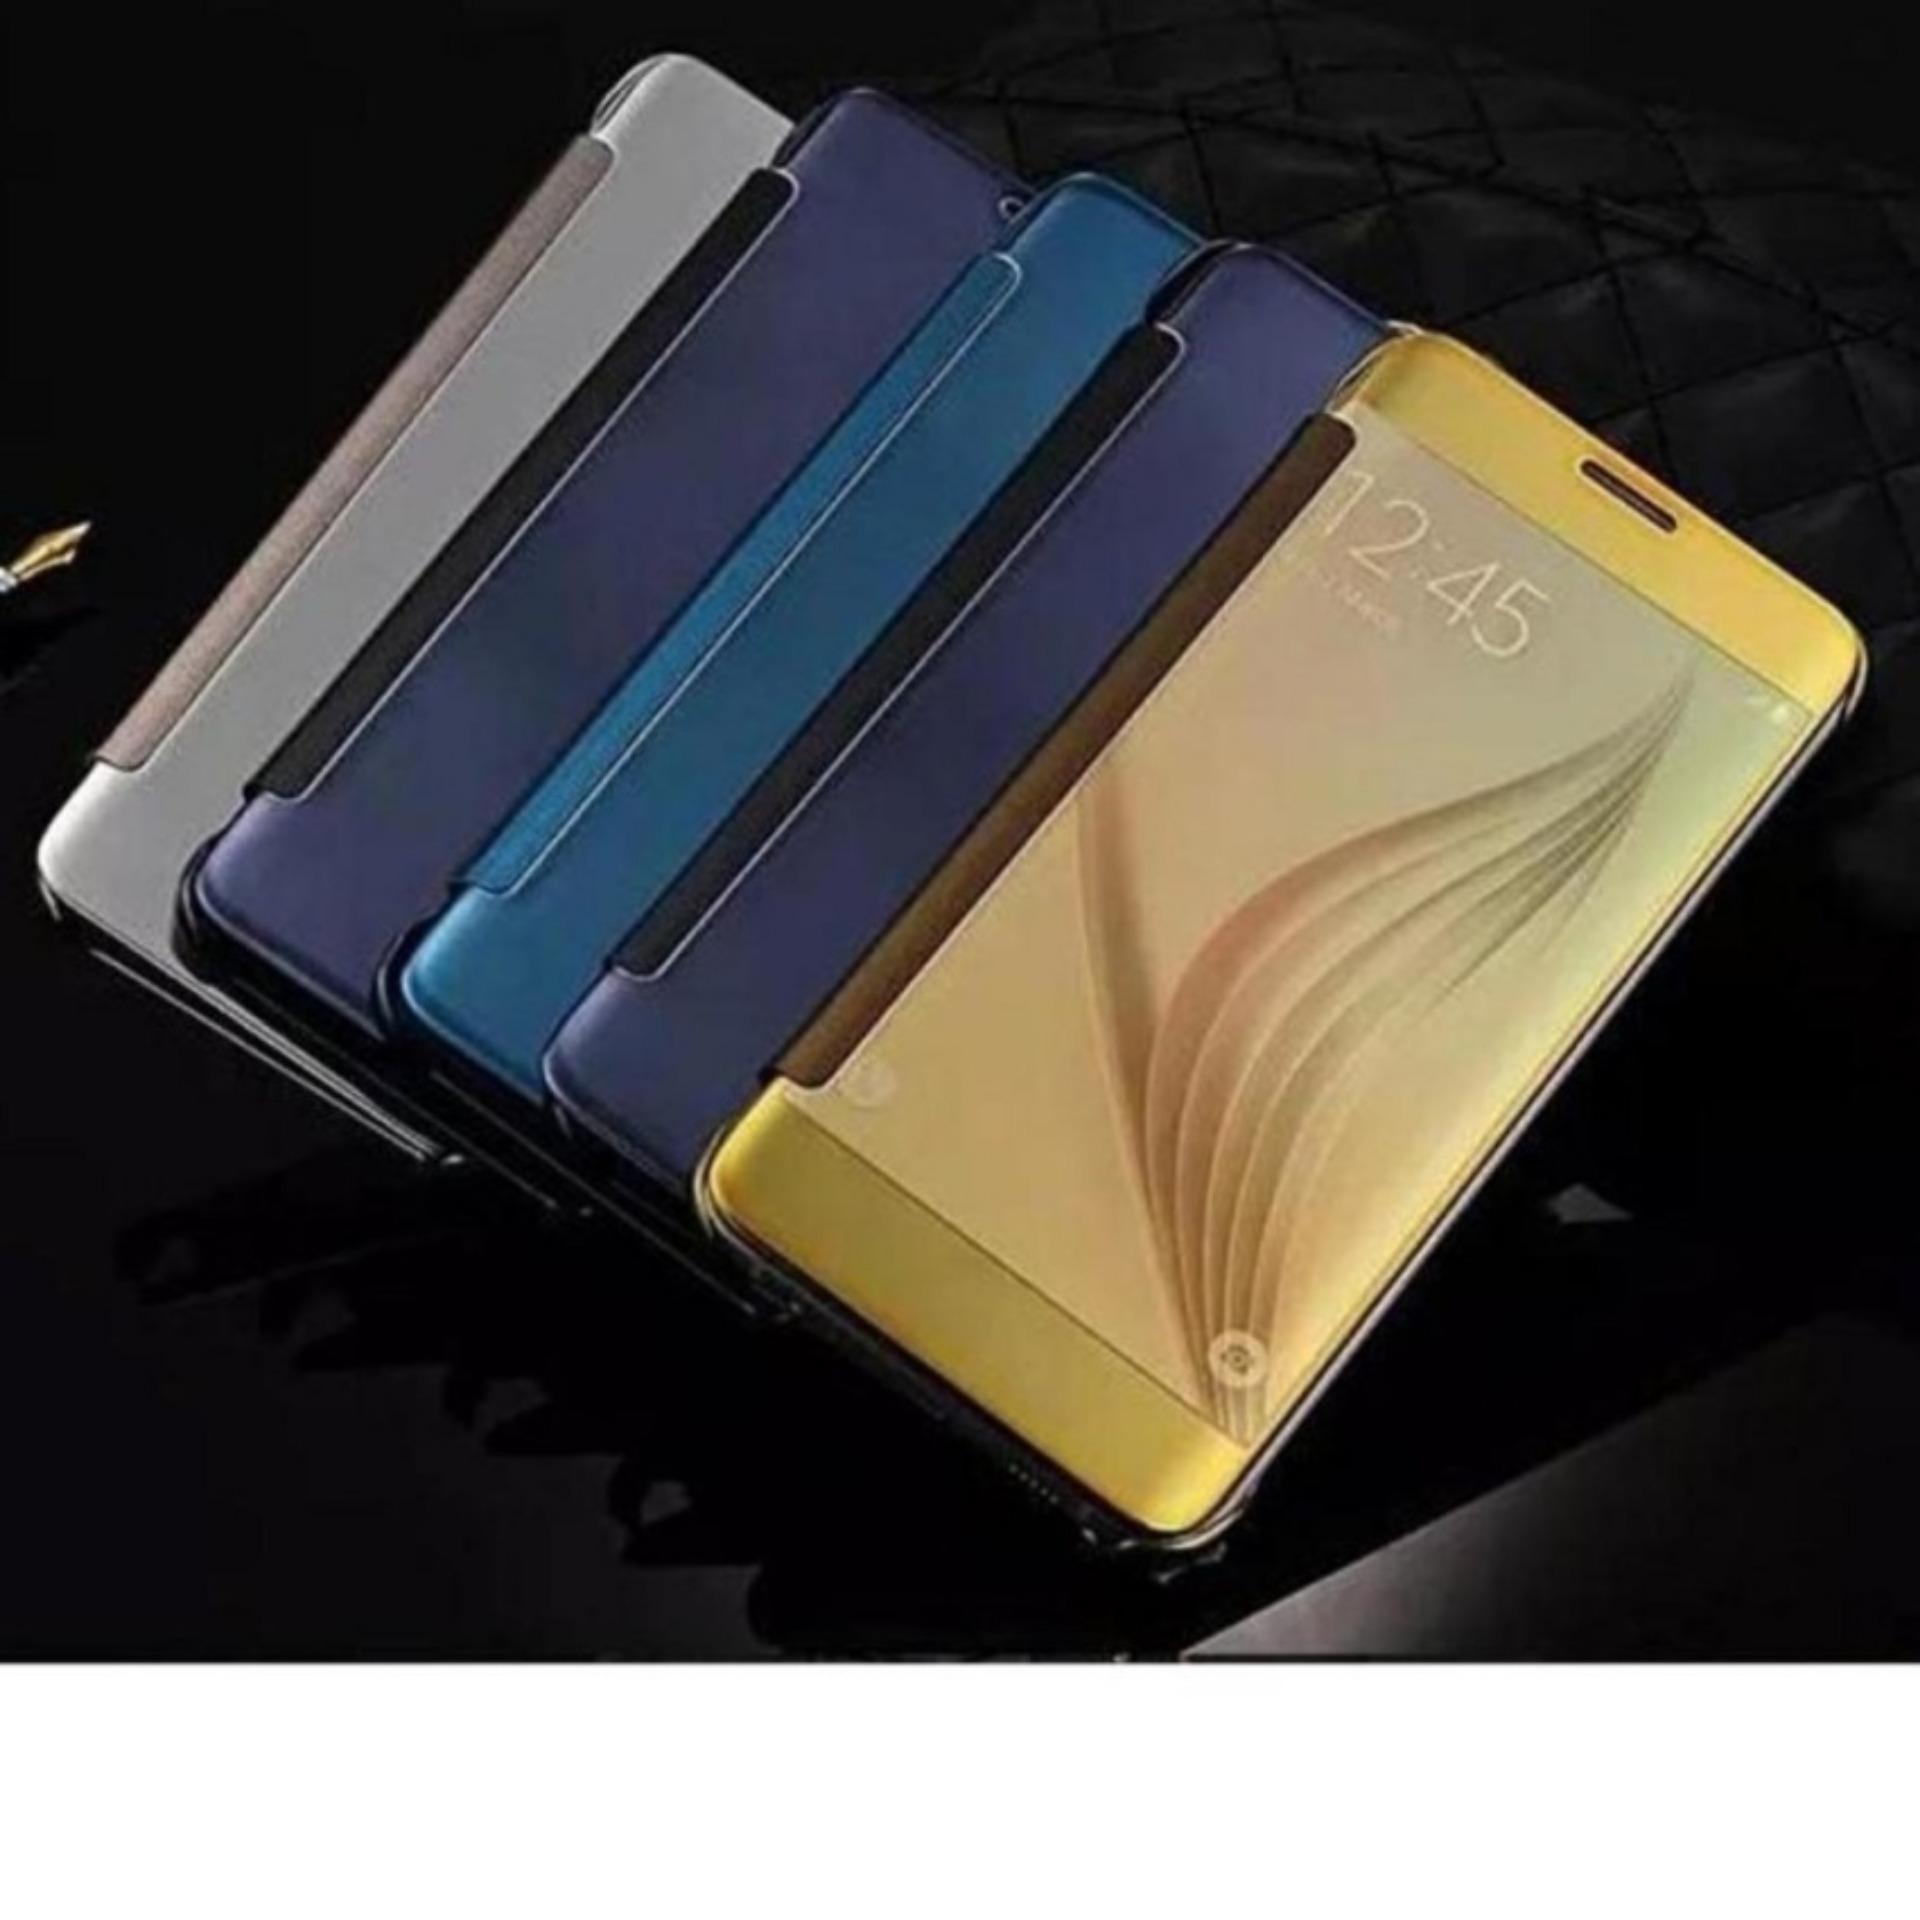 Case Samsung Galaxy A5 2017 Flipcase Flip Mirror Cover S View Source · Galaxy A3 2017 A320 Flipcase Flip Mirror Cover SView Transparan Auto